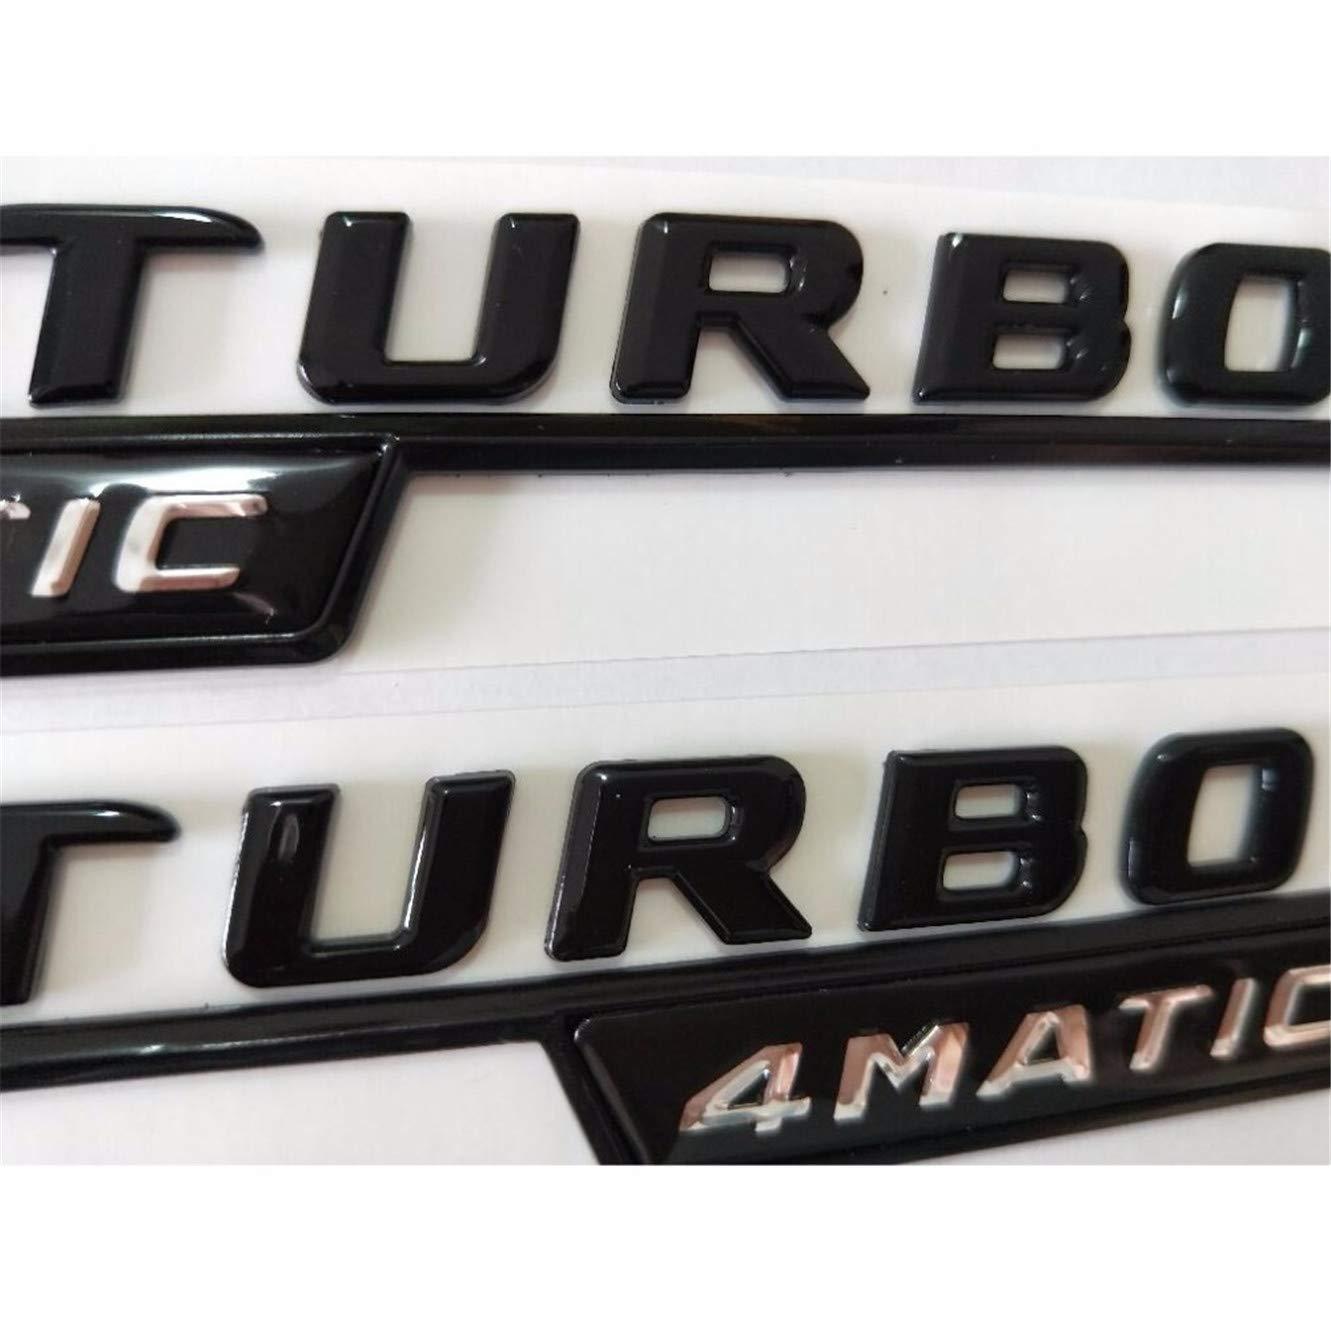 GLA 45 Gloss Glossy Black Fender Trunk Lid Emblem Emblems Badges W176 W177 A45 X117 CLA45 X156 GLA45 AMG TURBO 4MATIC